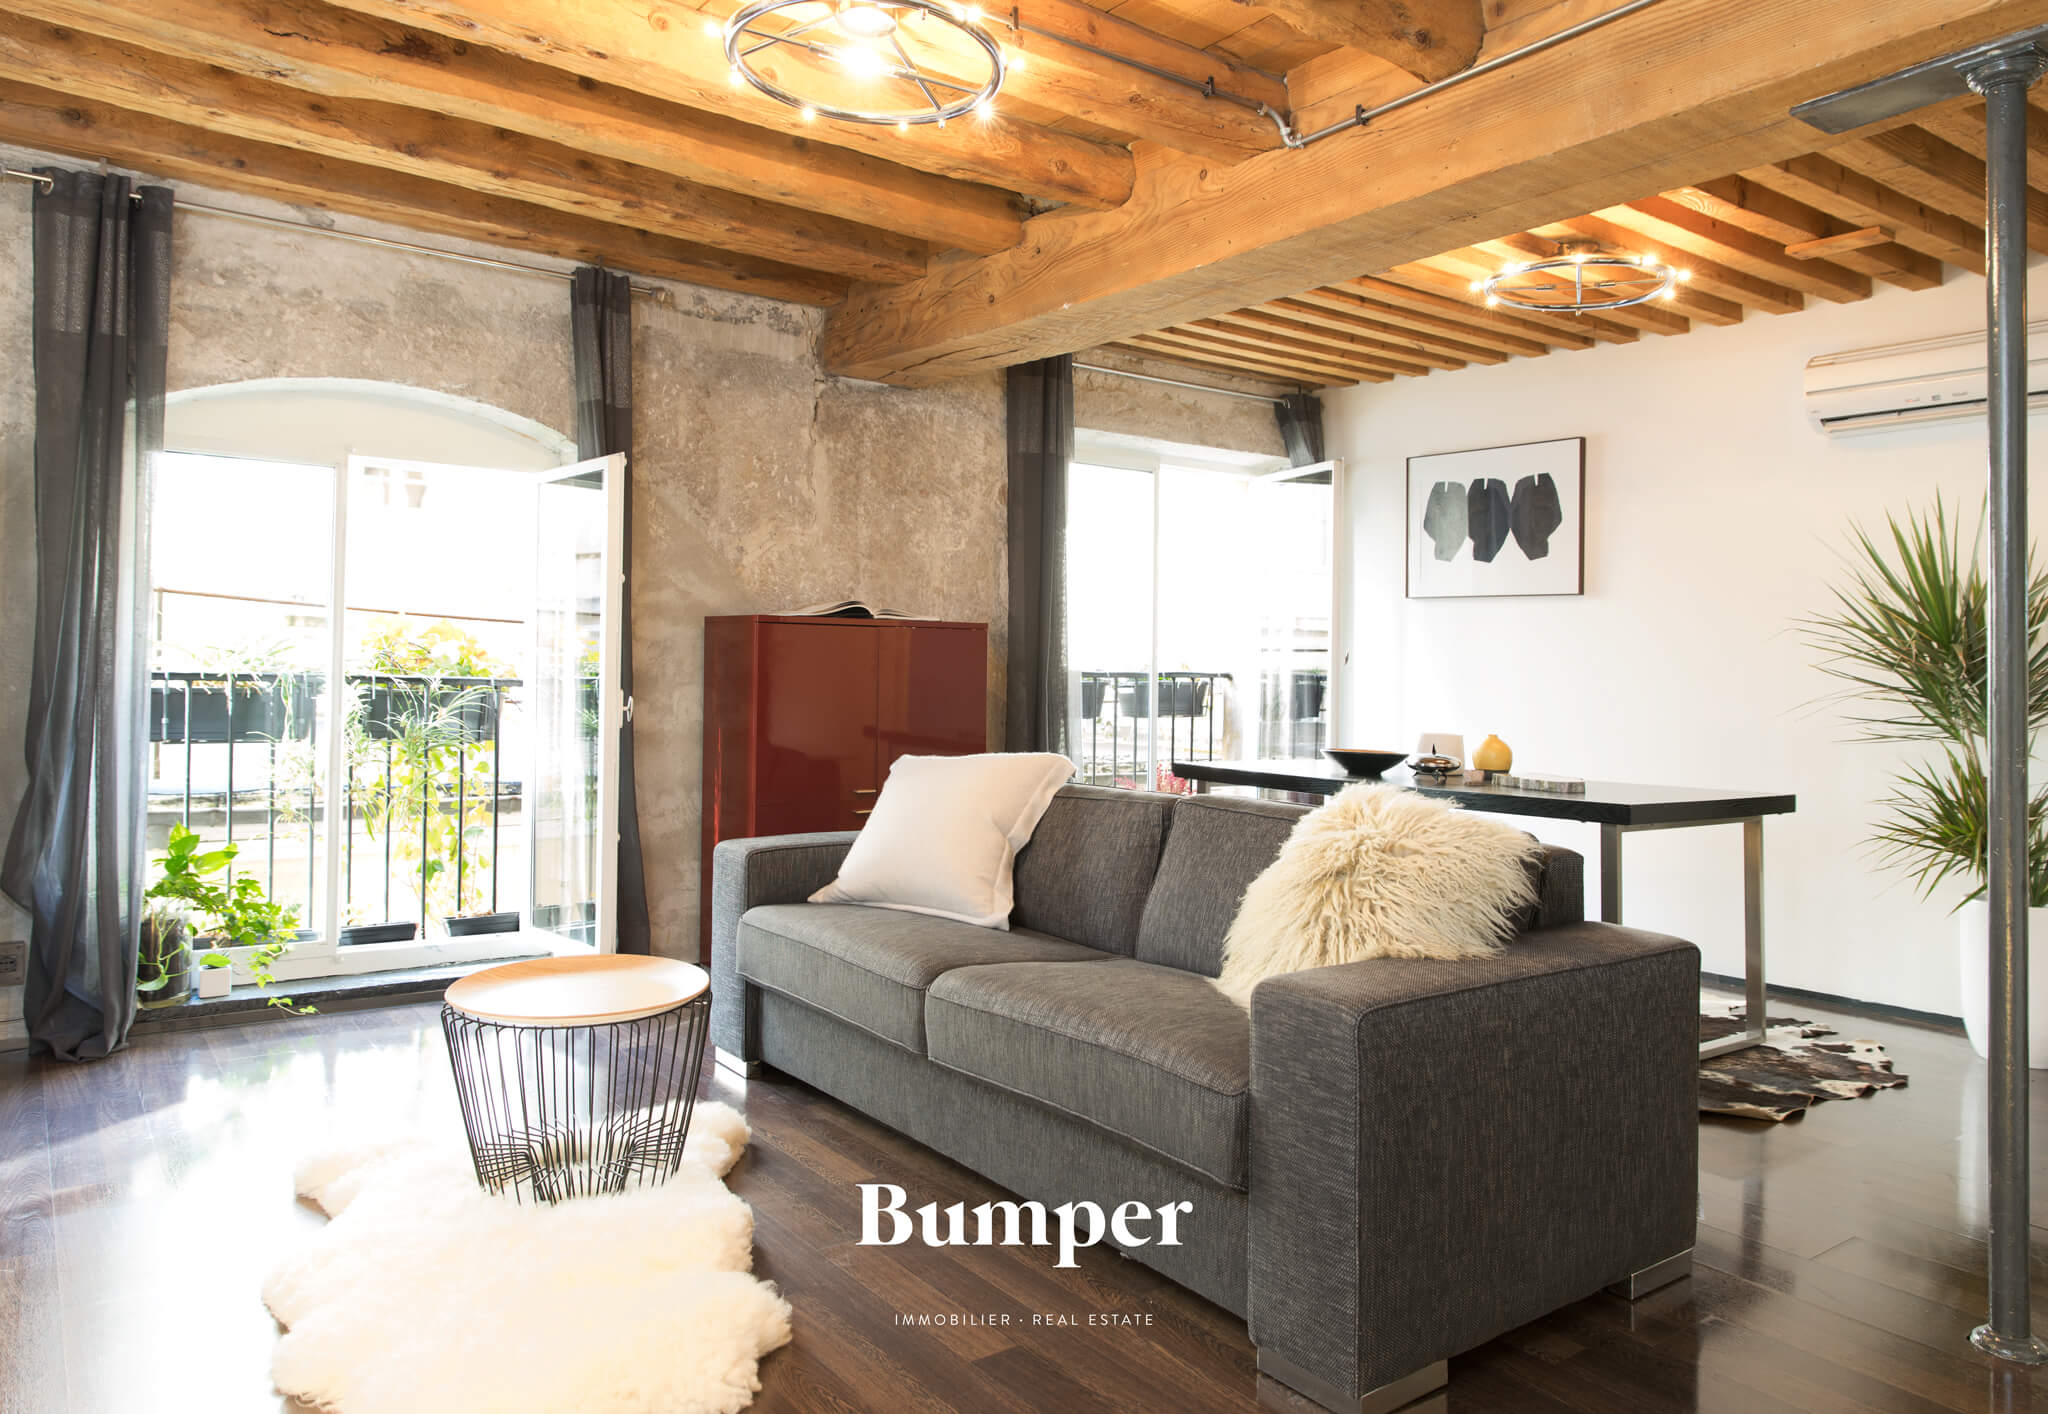 bumper-vendu-appartement-maison-immobilier20.jpg